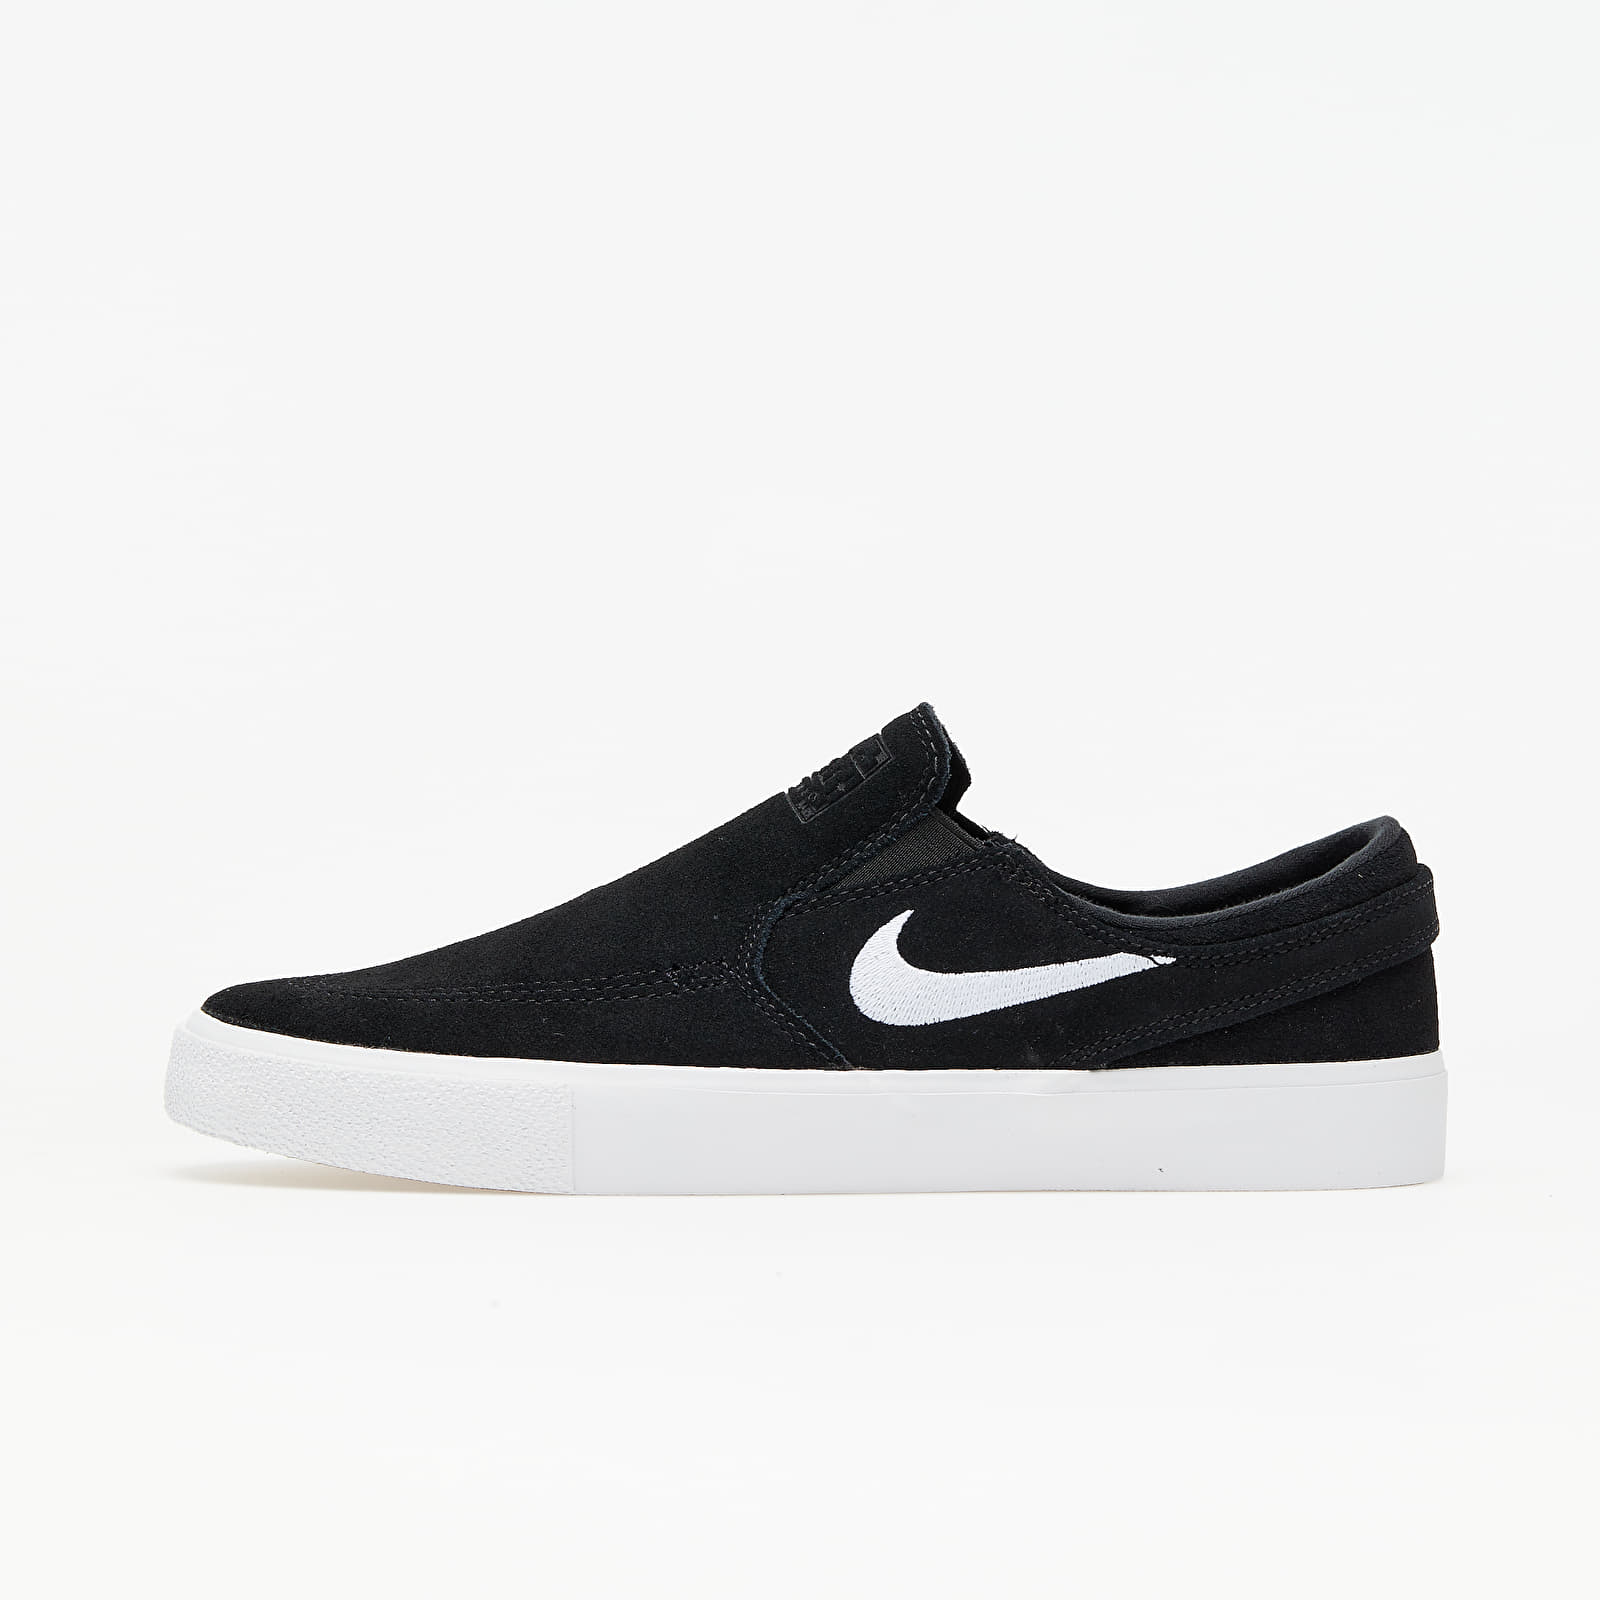 Men's shoes Nike SB Zoom Stefan Janoski Slip RM Black/ White-White